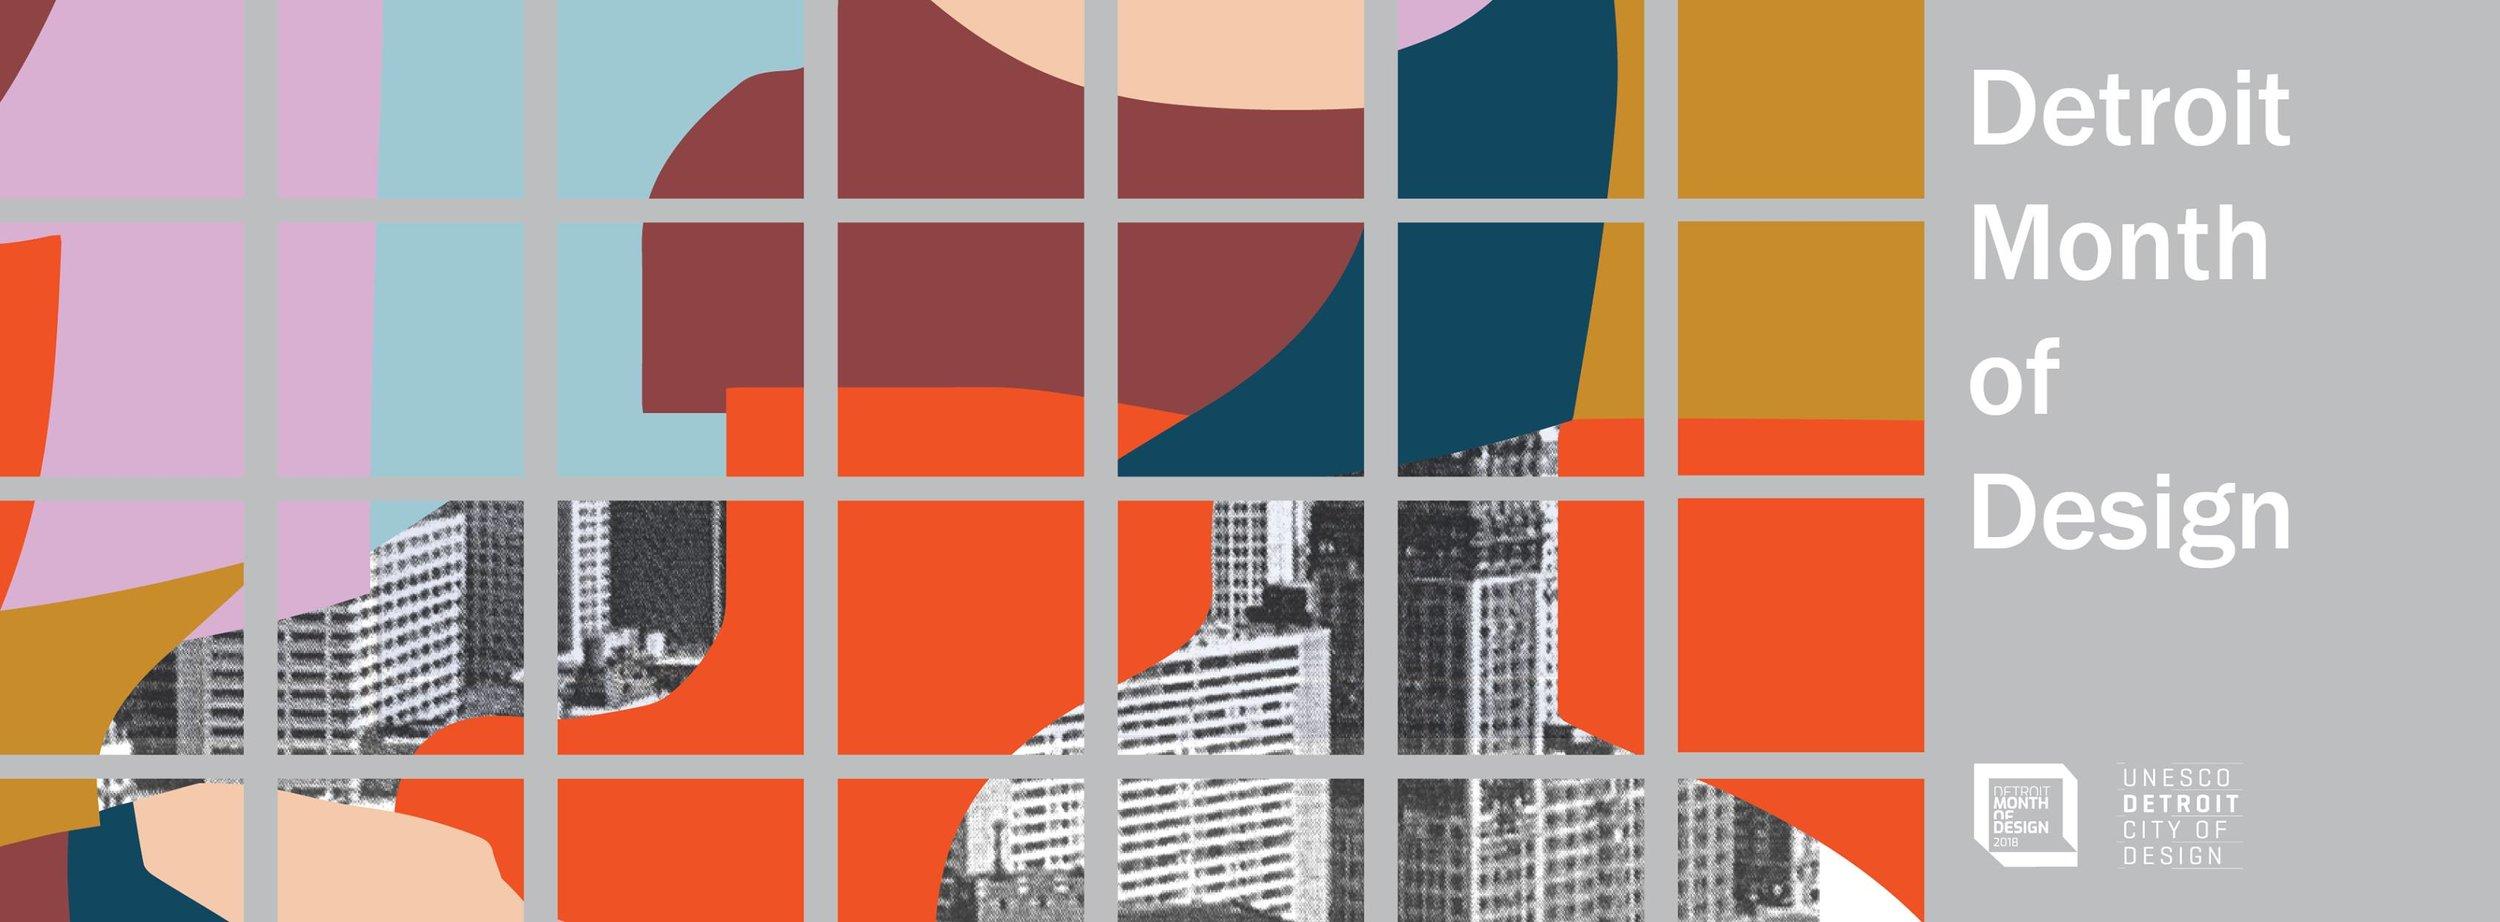 Proud partner of the Detroit Month of Design 2018.